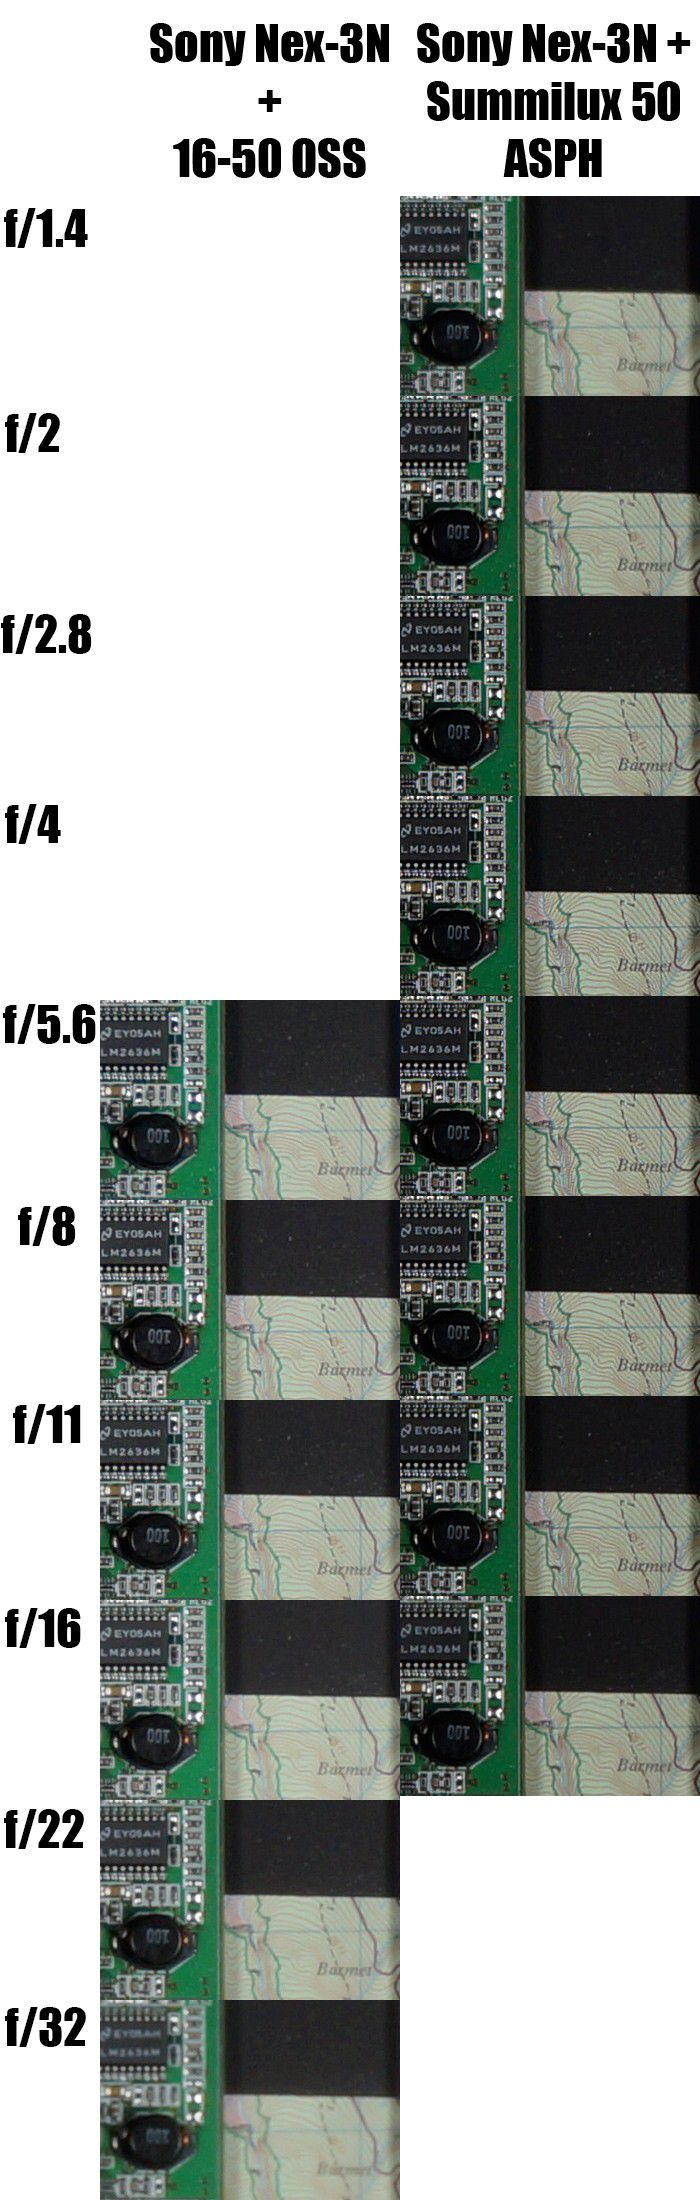 Comparatif Nex3N OSS vs Summilux